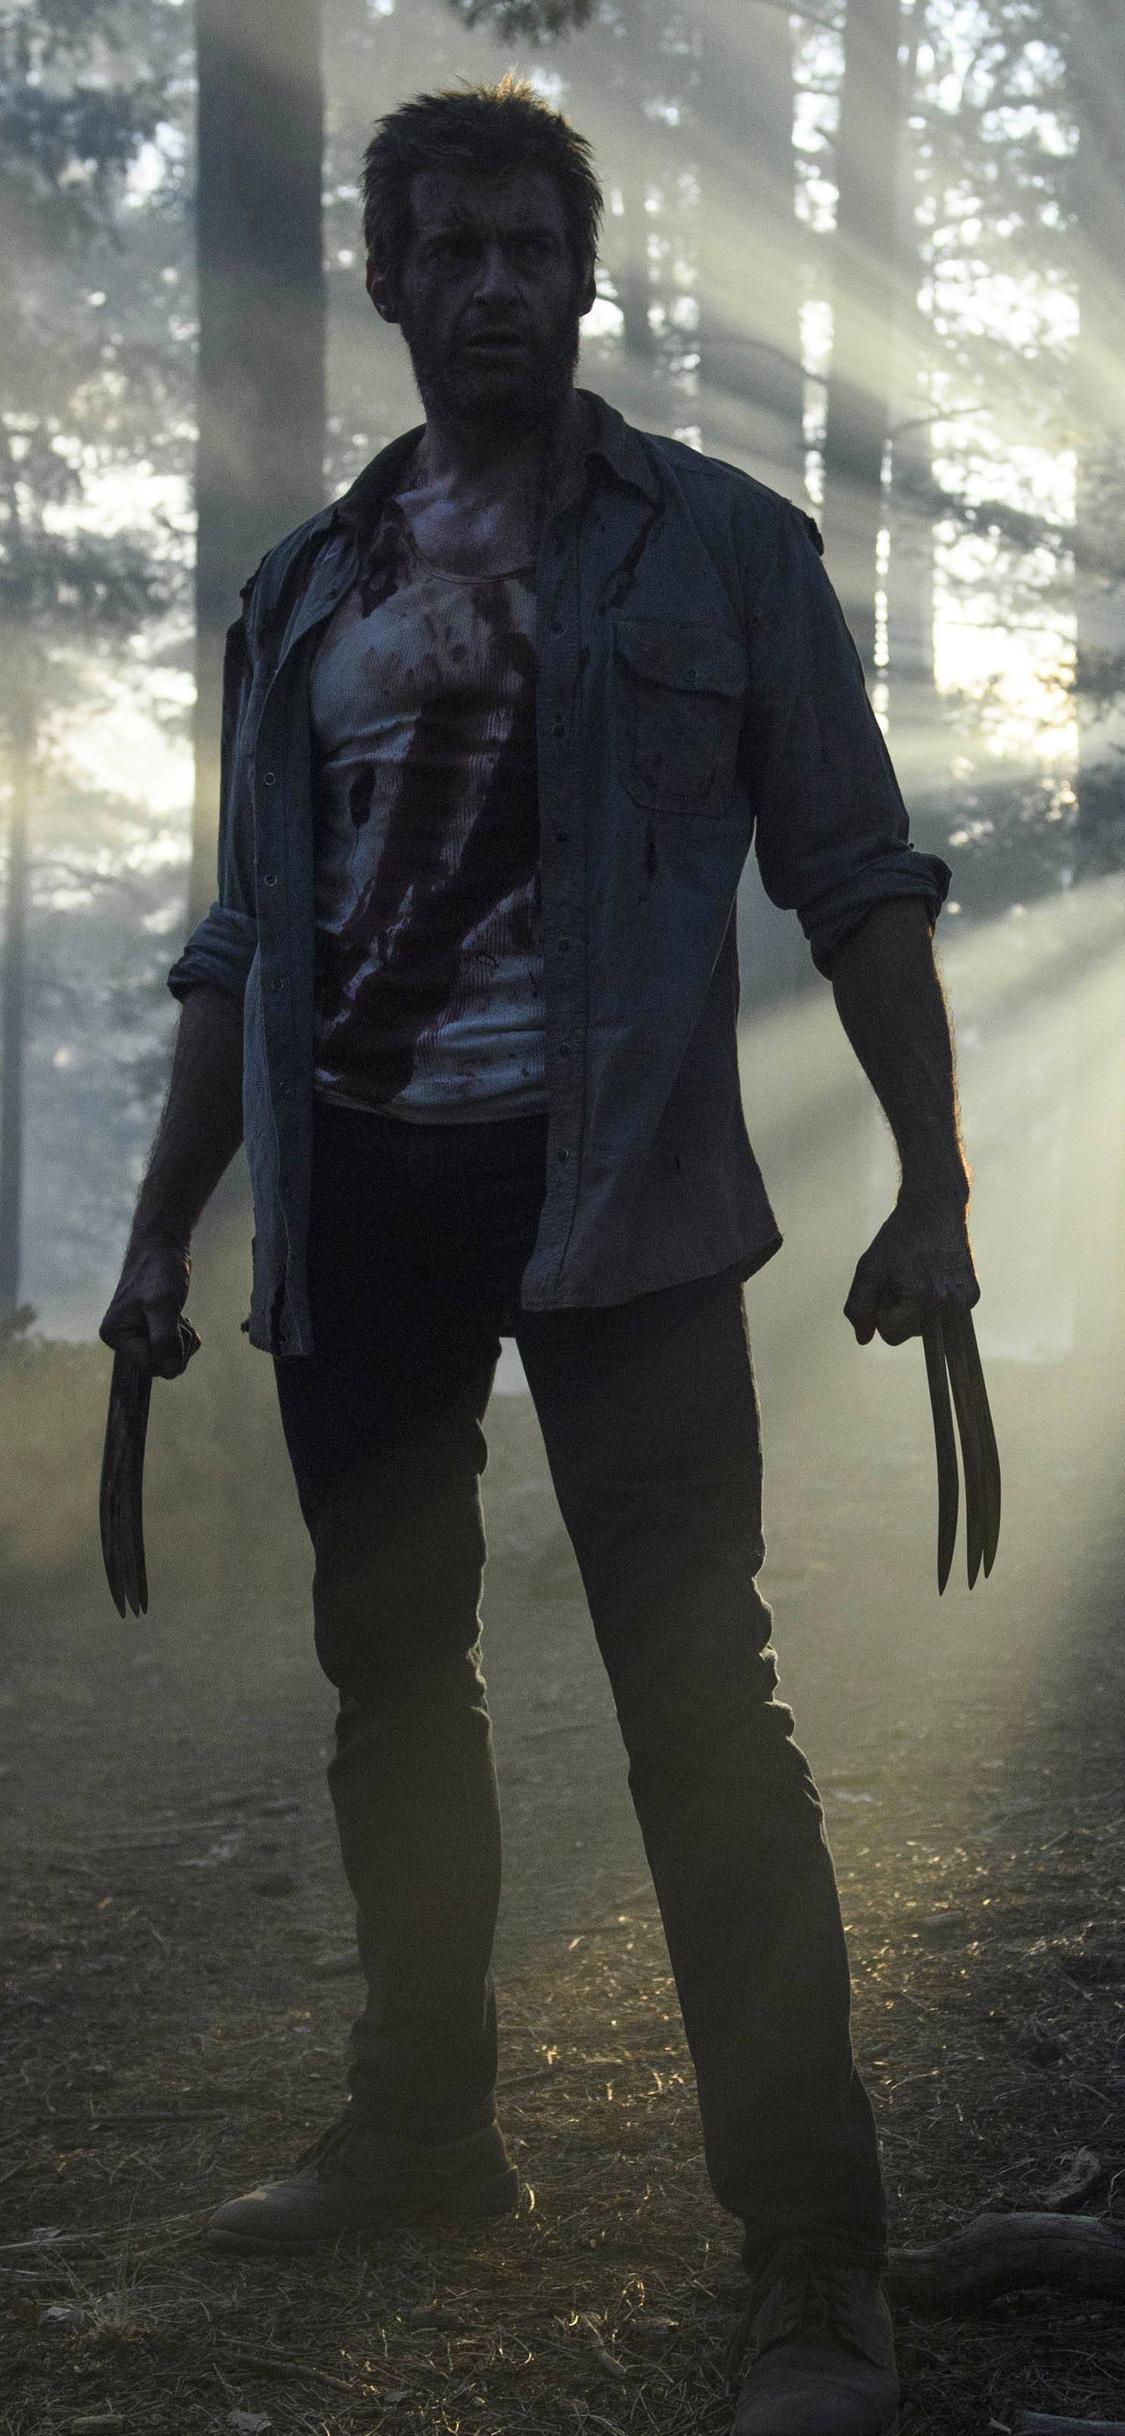 1125x2436 Hugh Jackman As Wolverine In Logan Iphone Xs Iphone 10